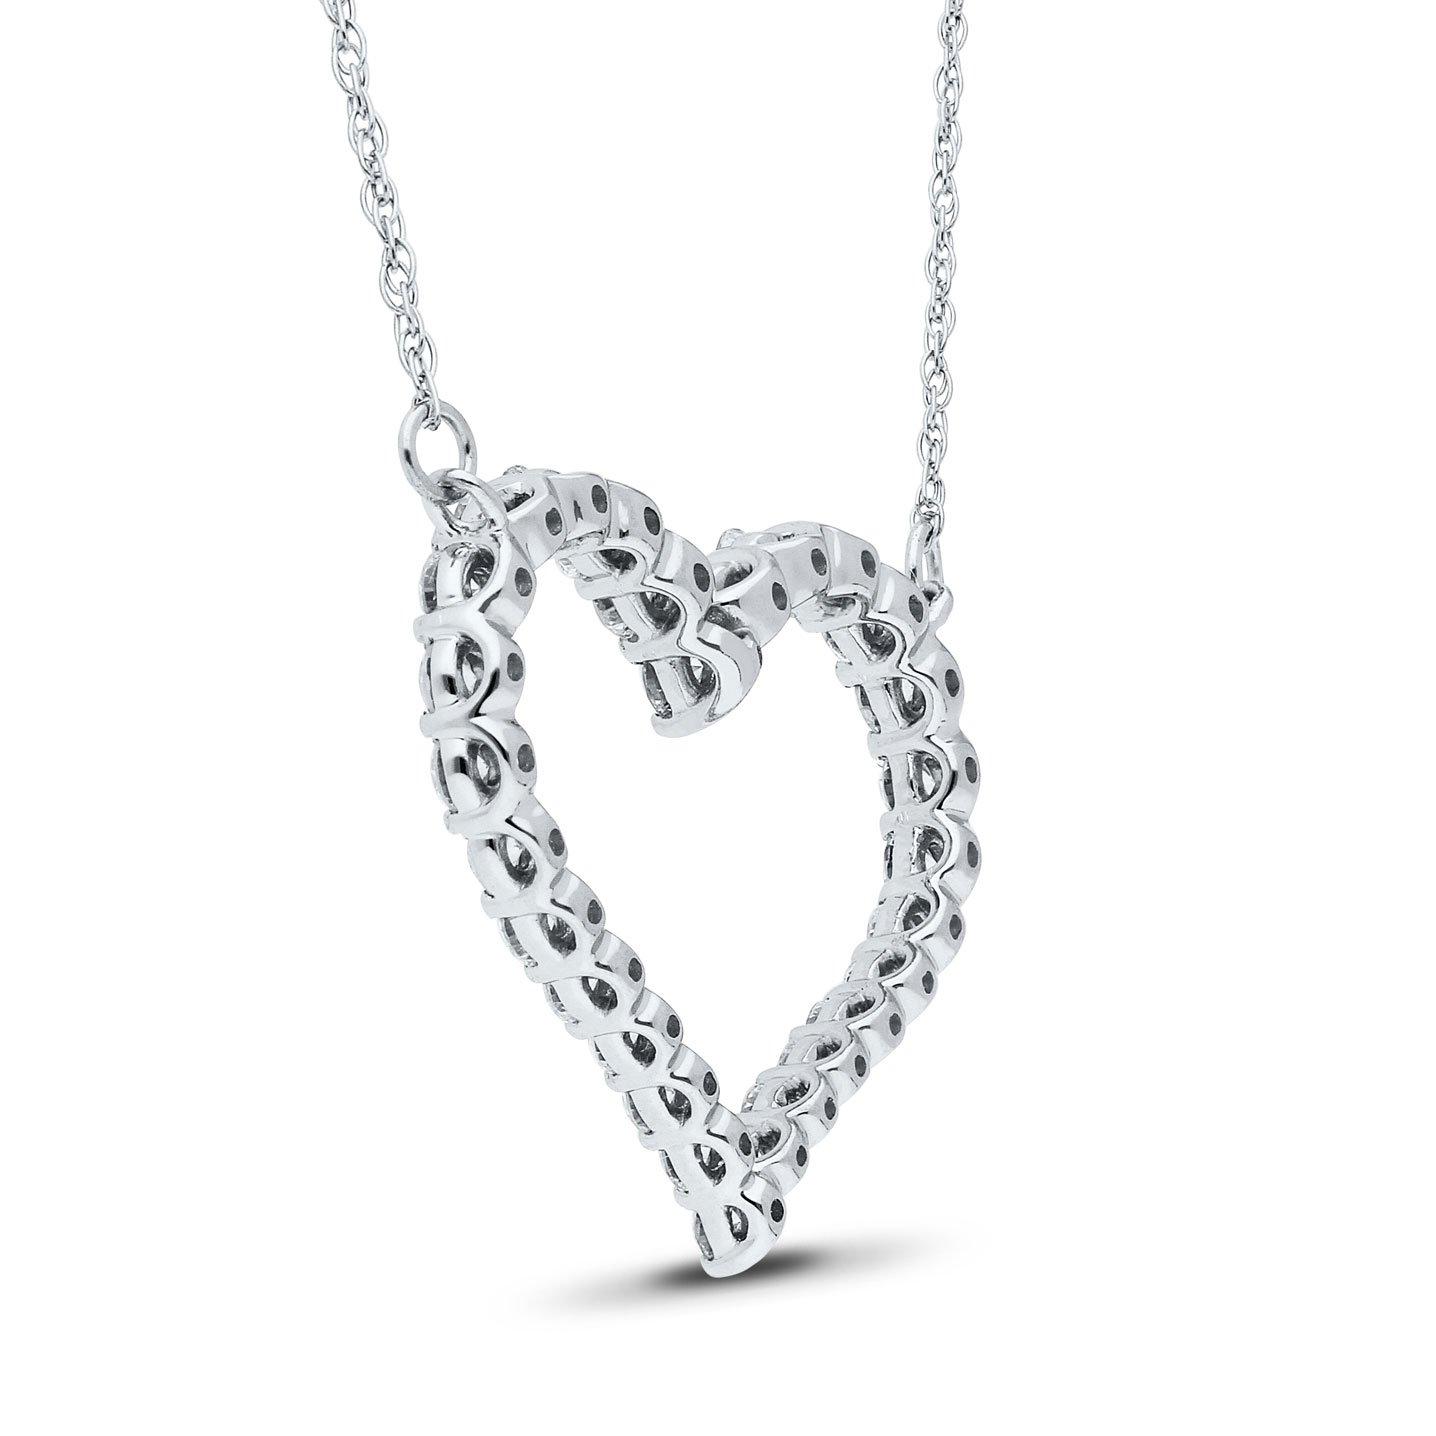 Aisha Diamond Pendant in White Gold - madeinUSAdiamonds